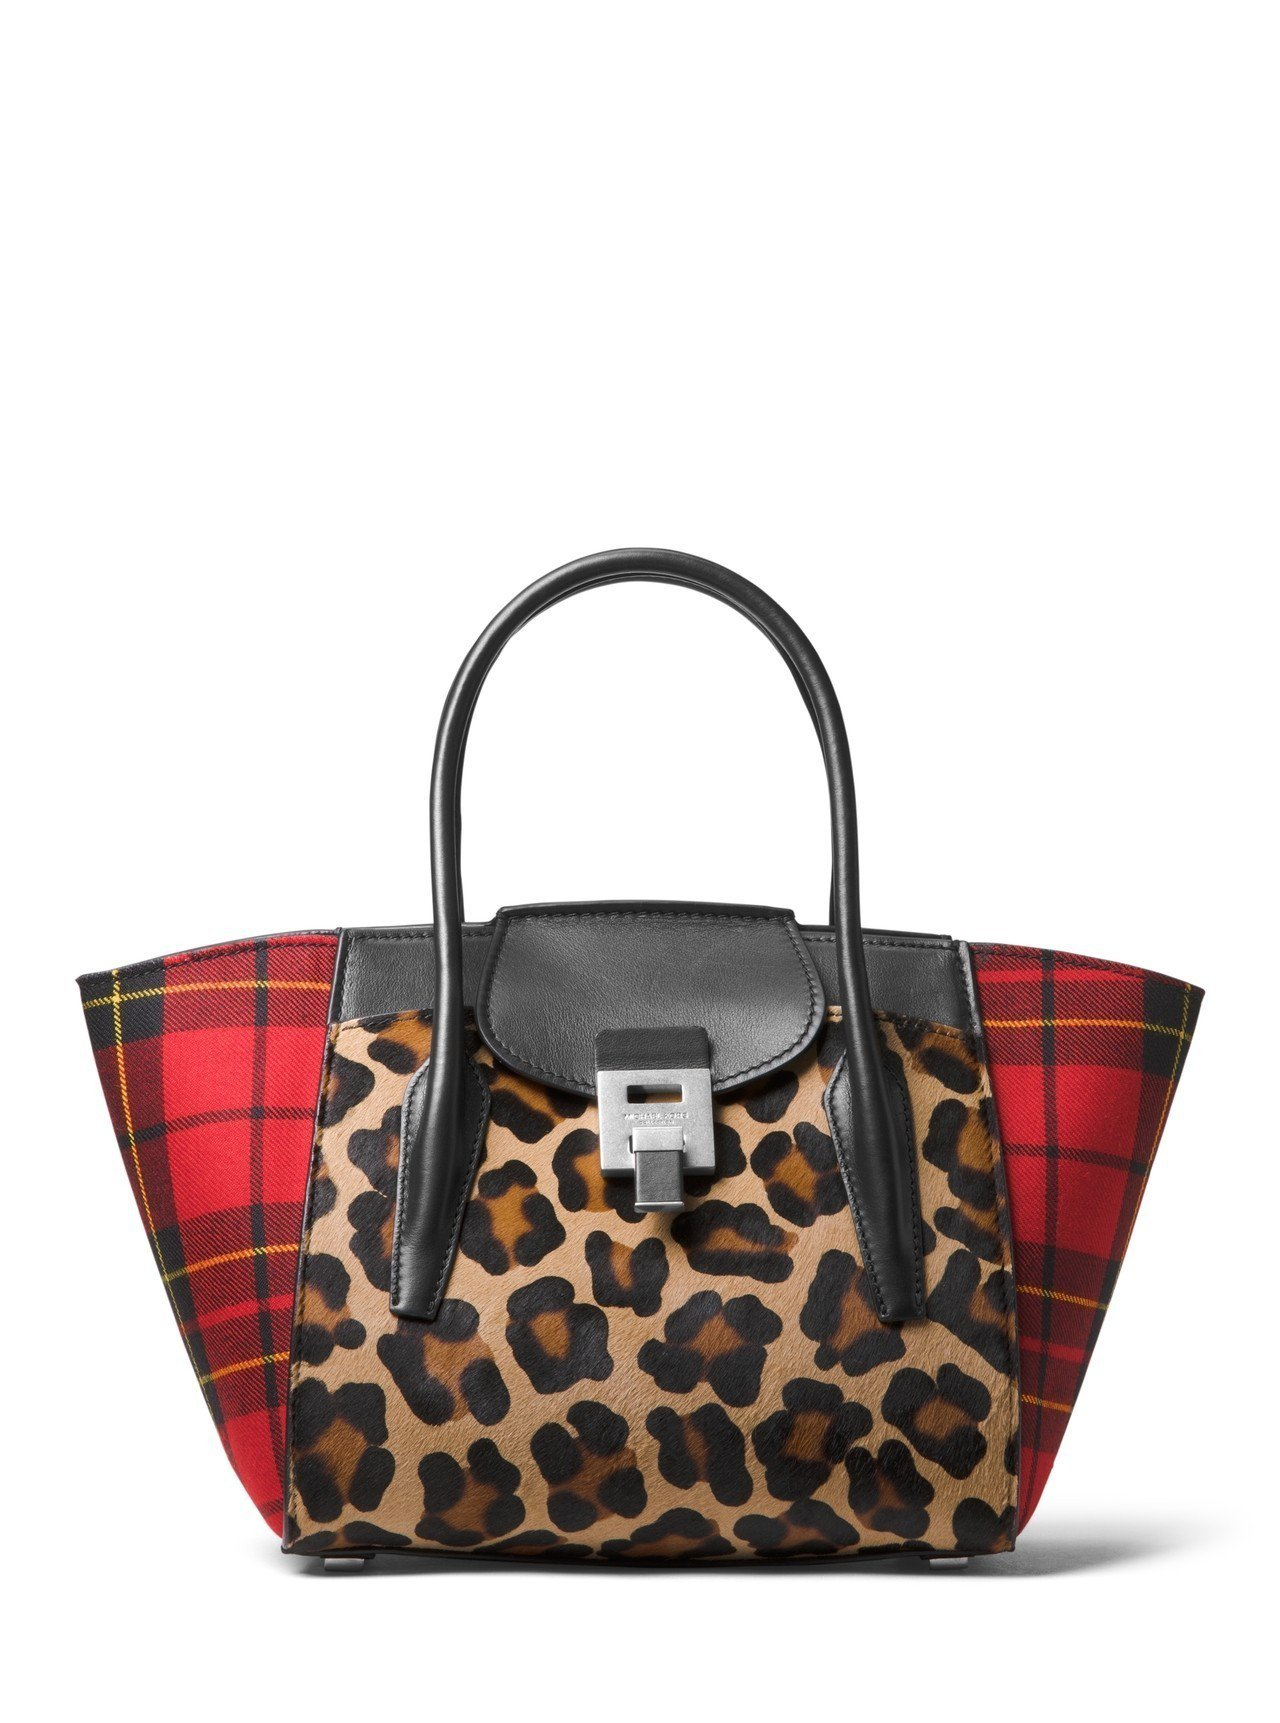 Bancroft豹紋紅格紋拼接提包,售價48,900元。圖/MICHAEL KO...